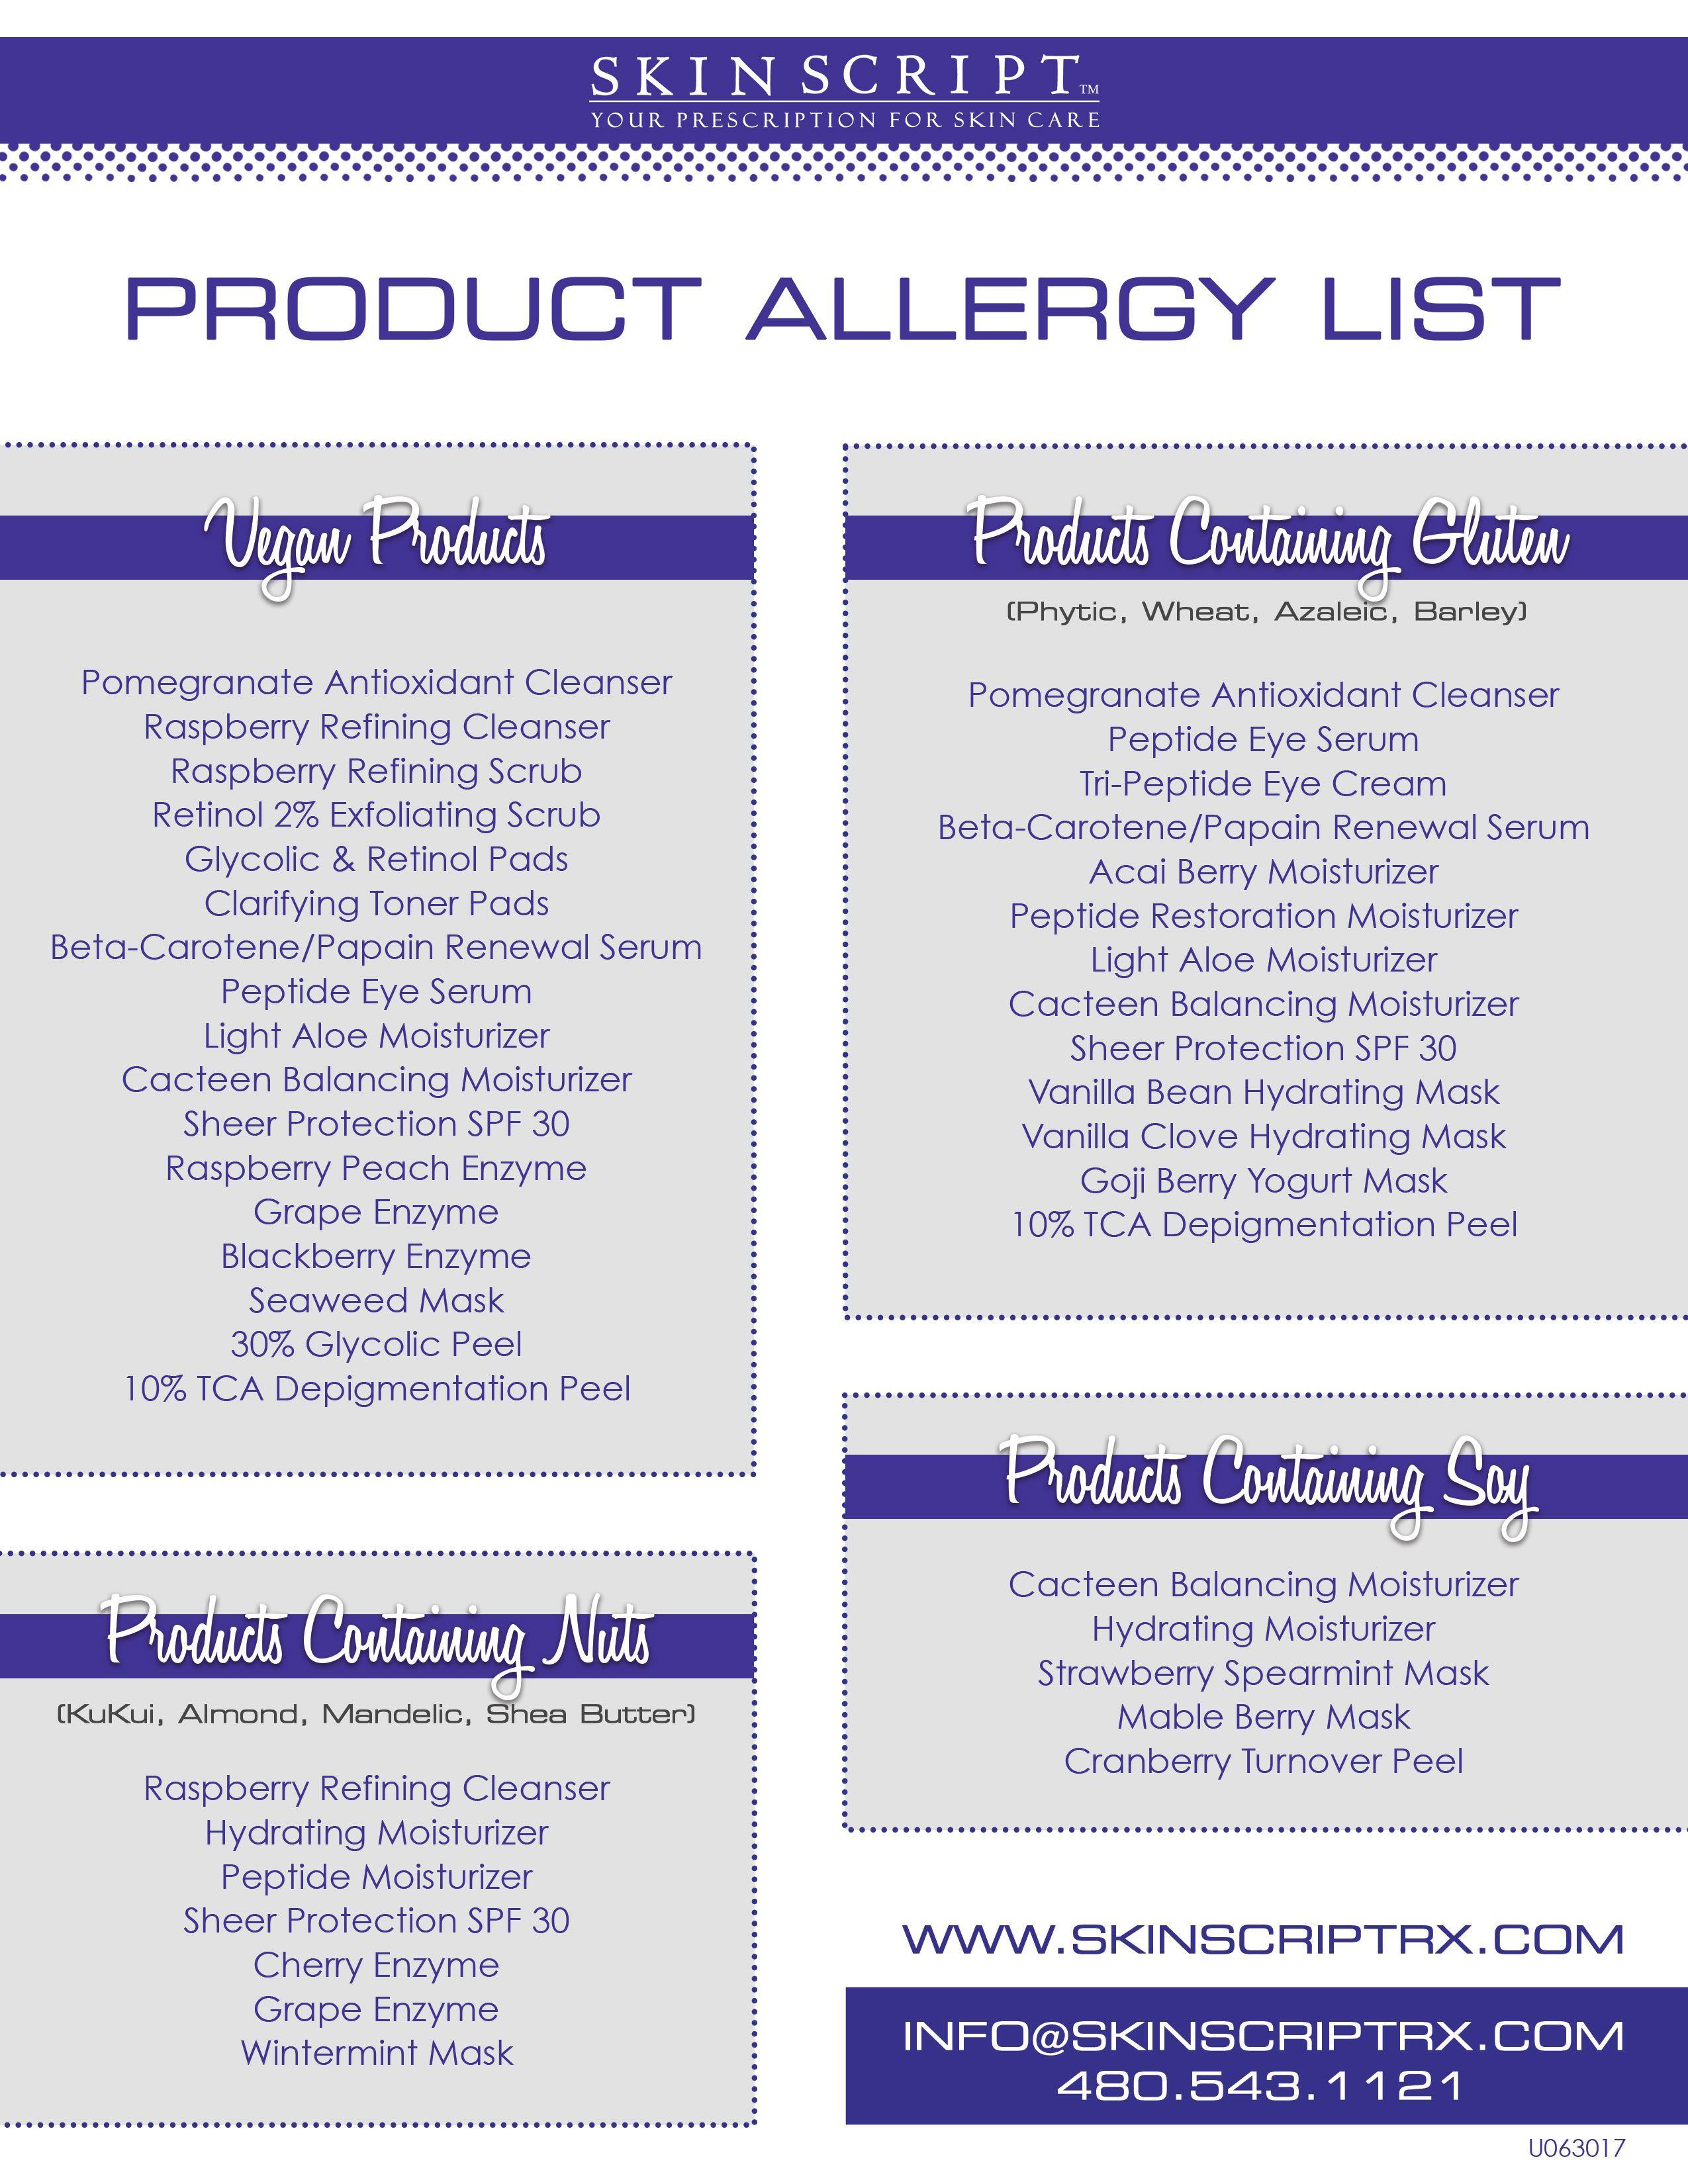 Productallergylist Gluten Vegan Soy Nuts Jpg 2550 3300 Skin Script Skin Aesthetics Professional Skin Care Products